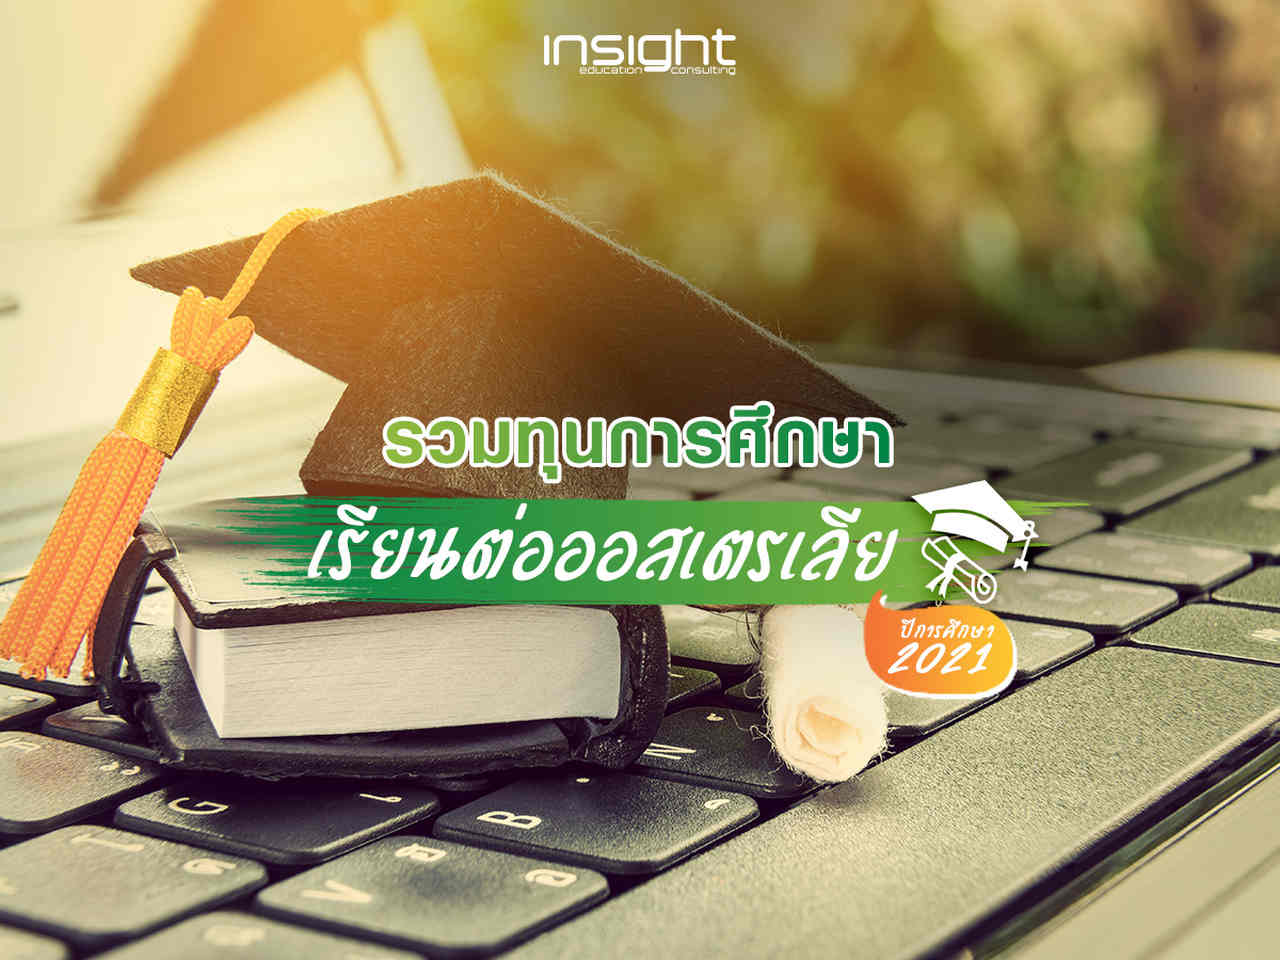 scholarships in australia 2021 for international students